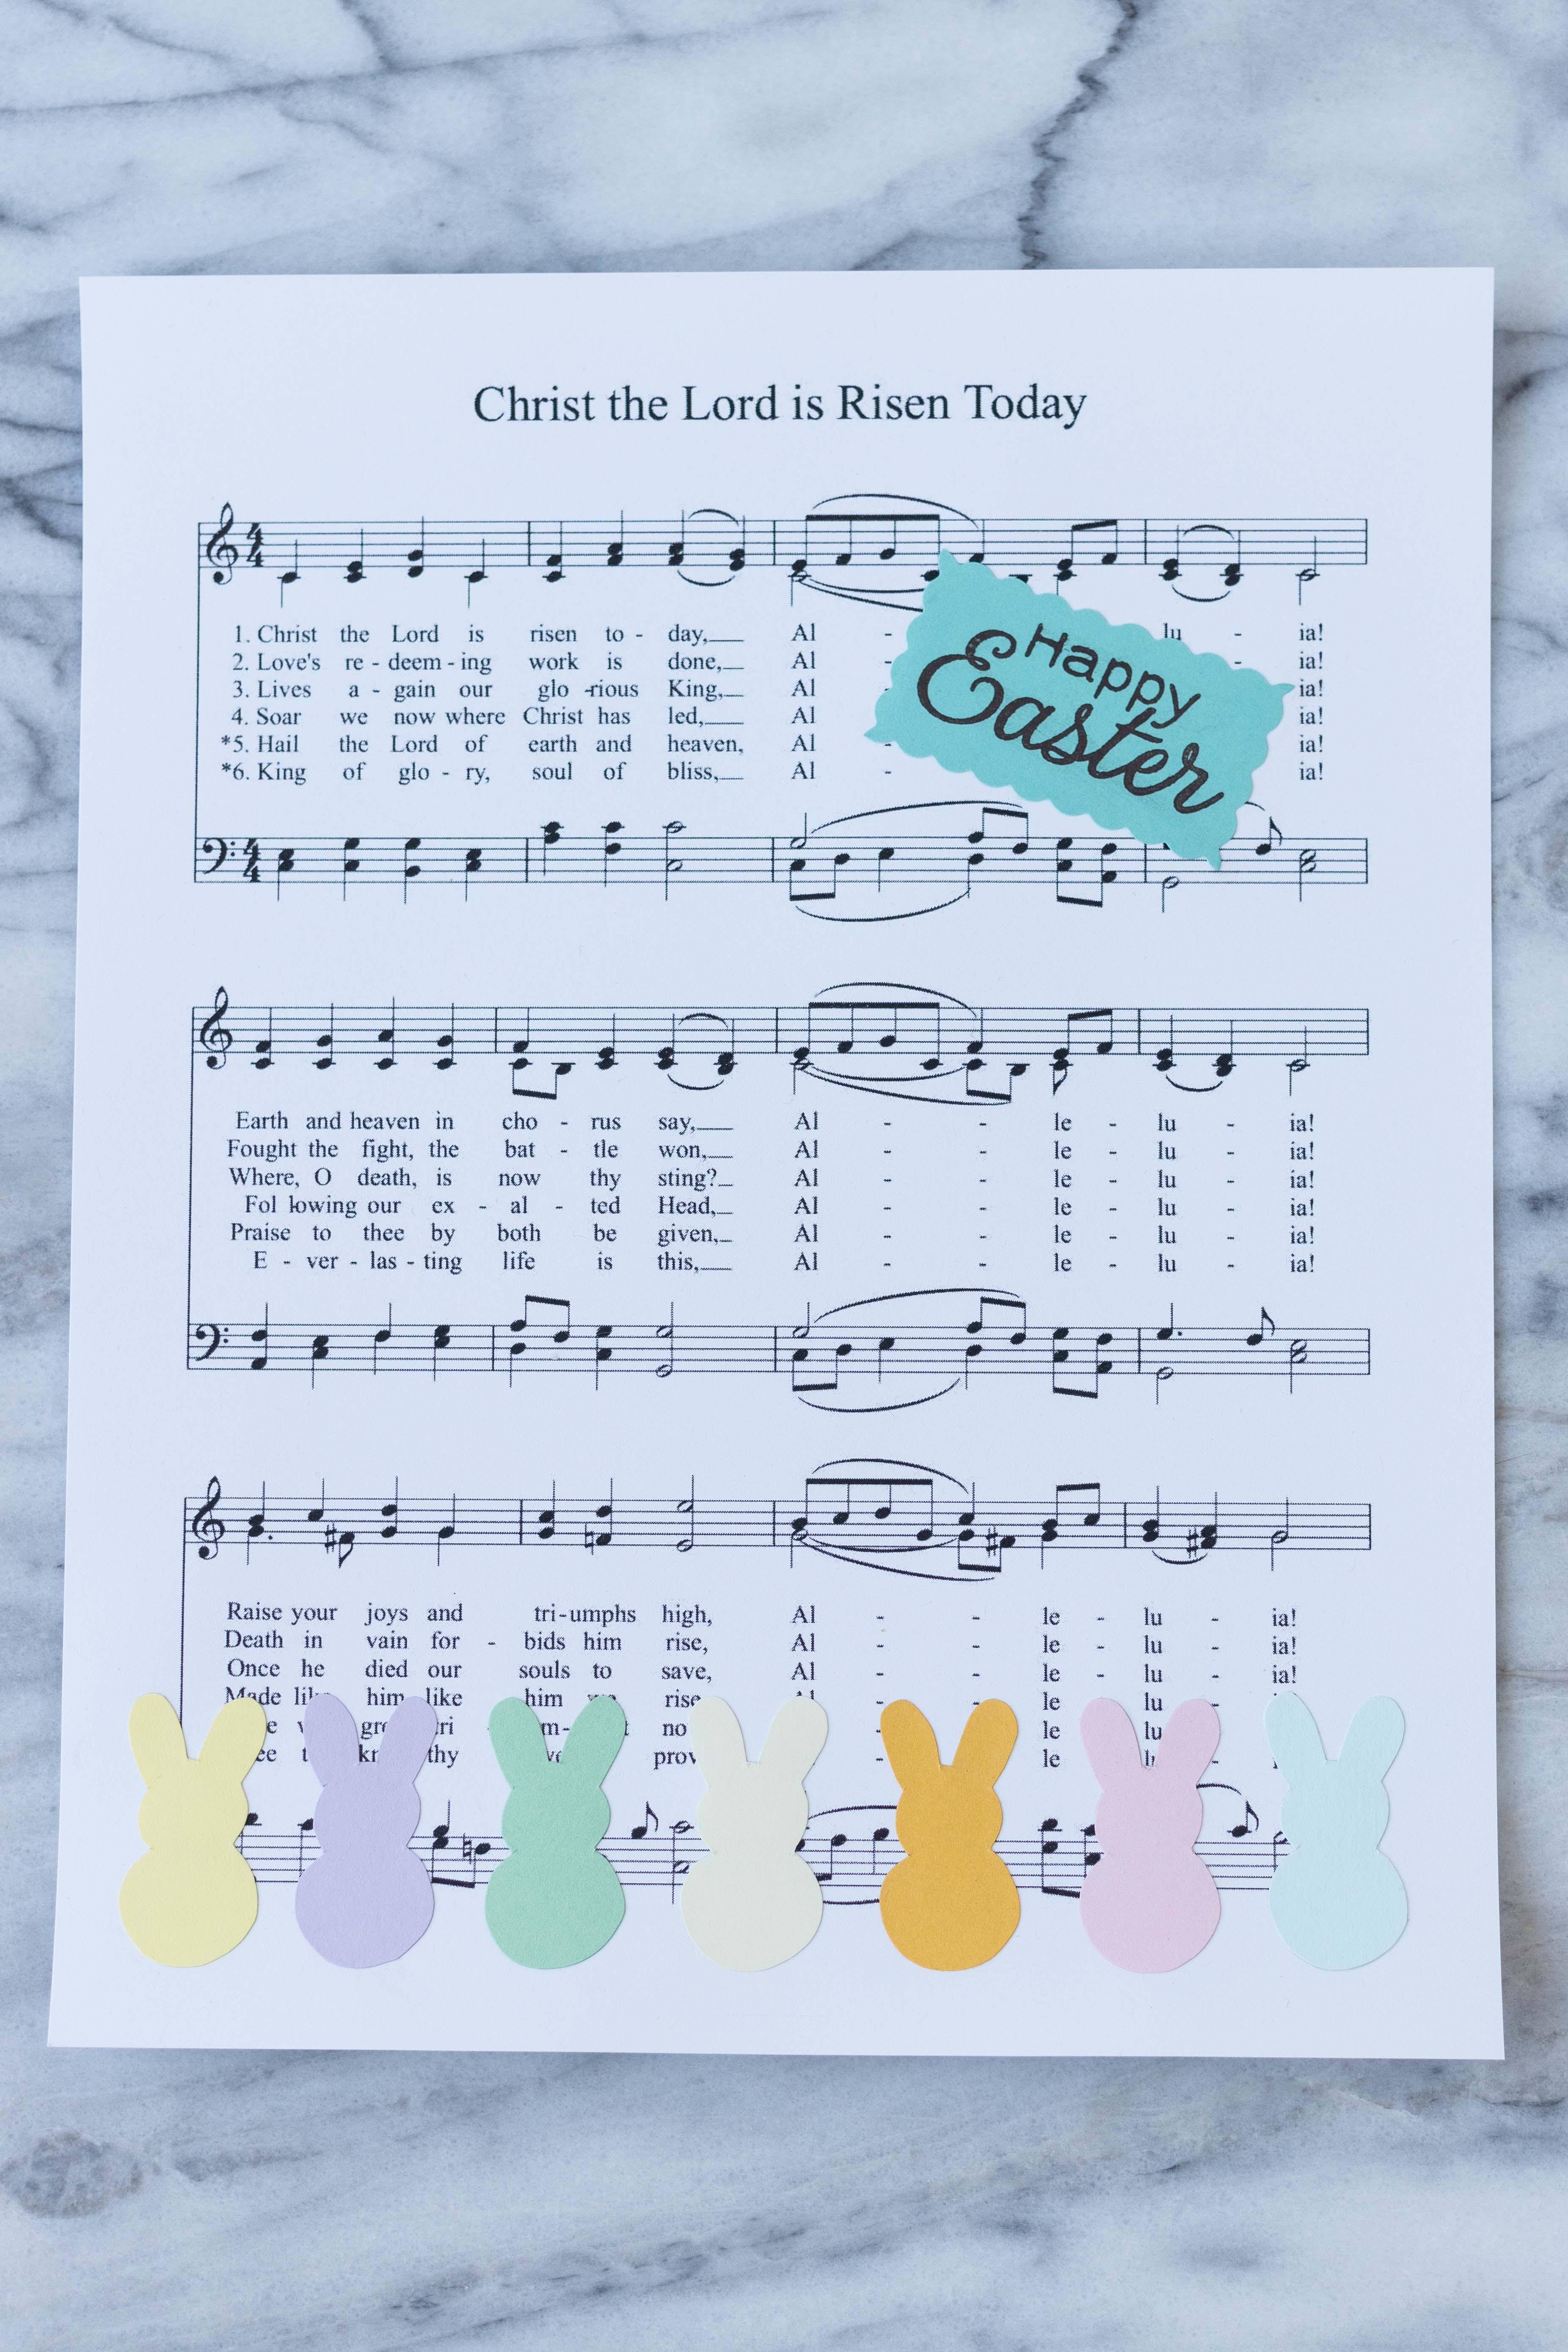 DIY Easter sheet music wall decor in progress! #Easter #DIY #sheetmusic | https://www.roseclearfield.com